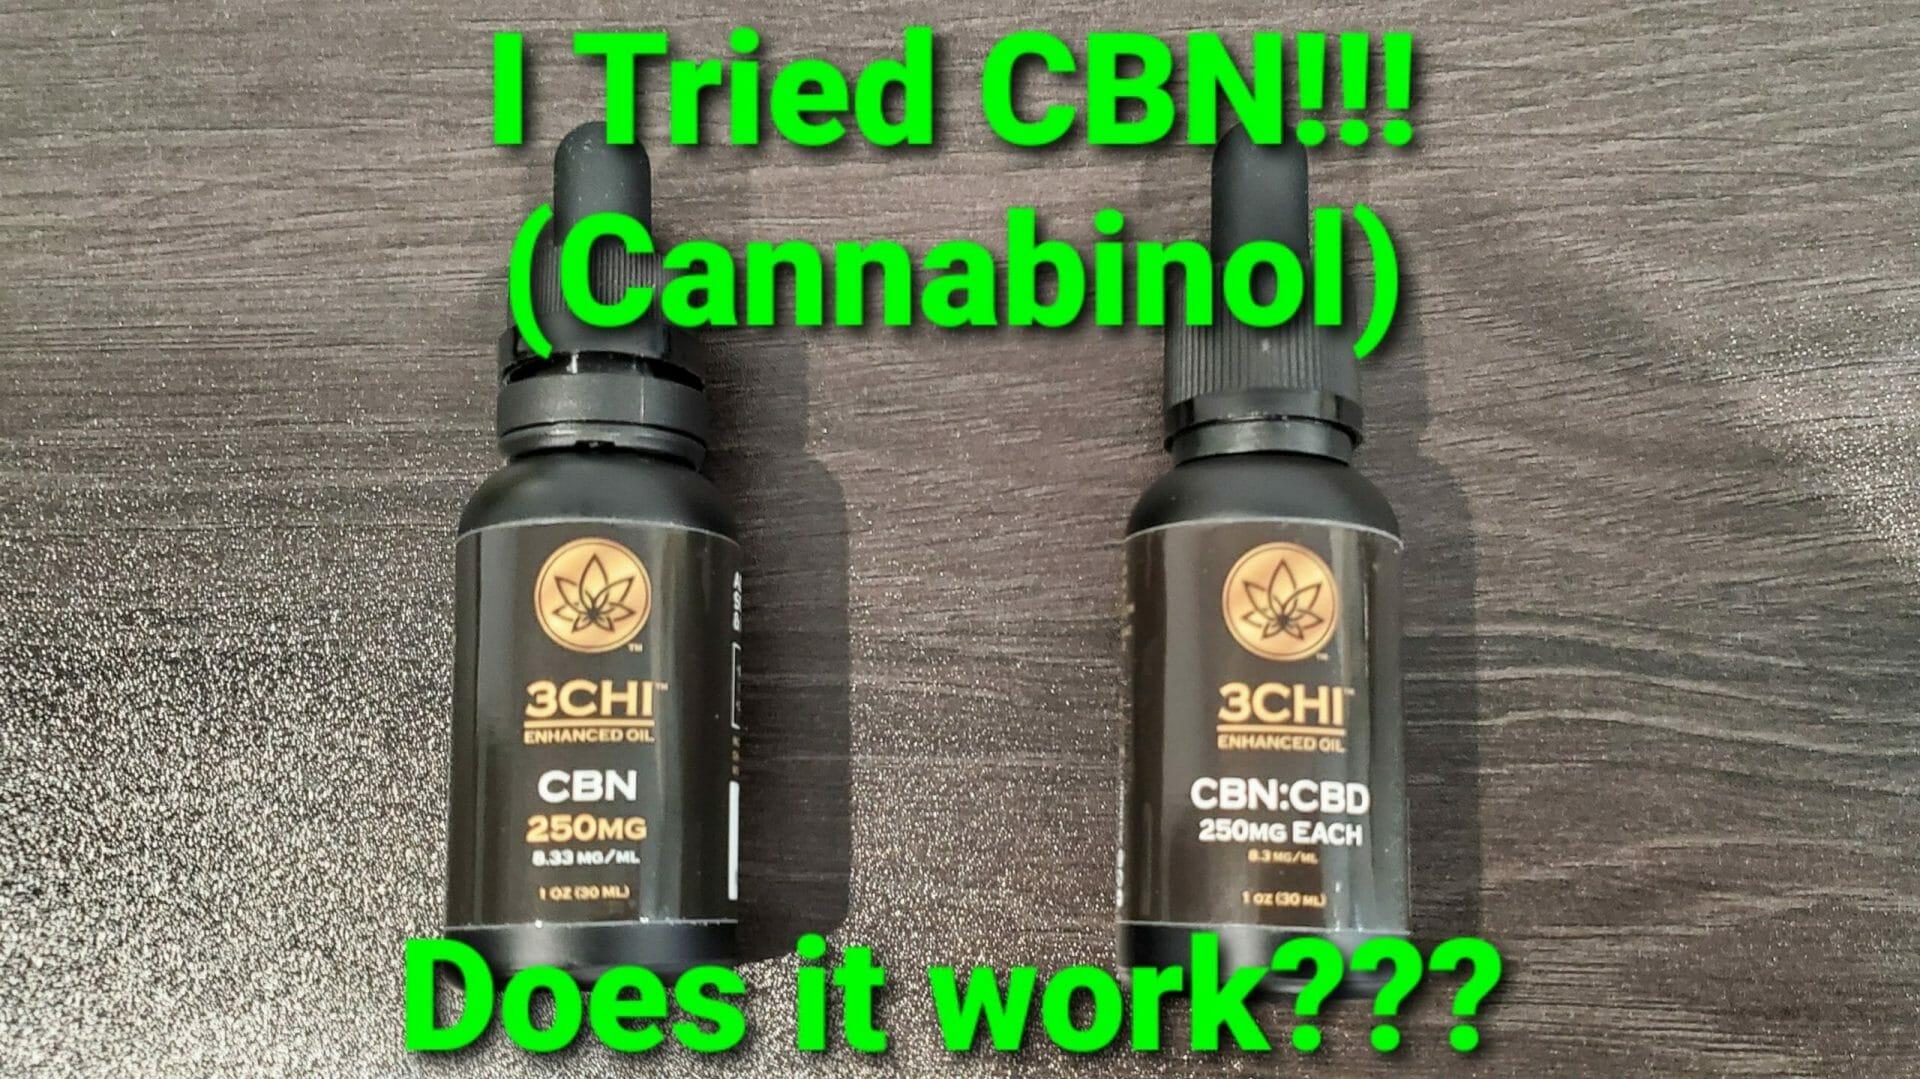 Cannabinol (CBN) – Miracle, Useless, or In-Between Cannabinoid?